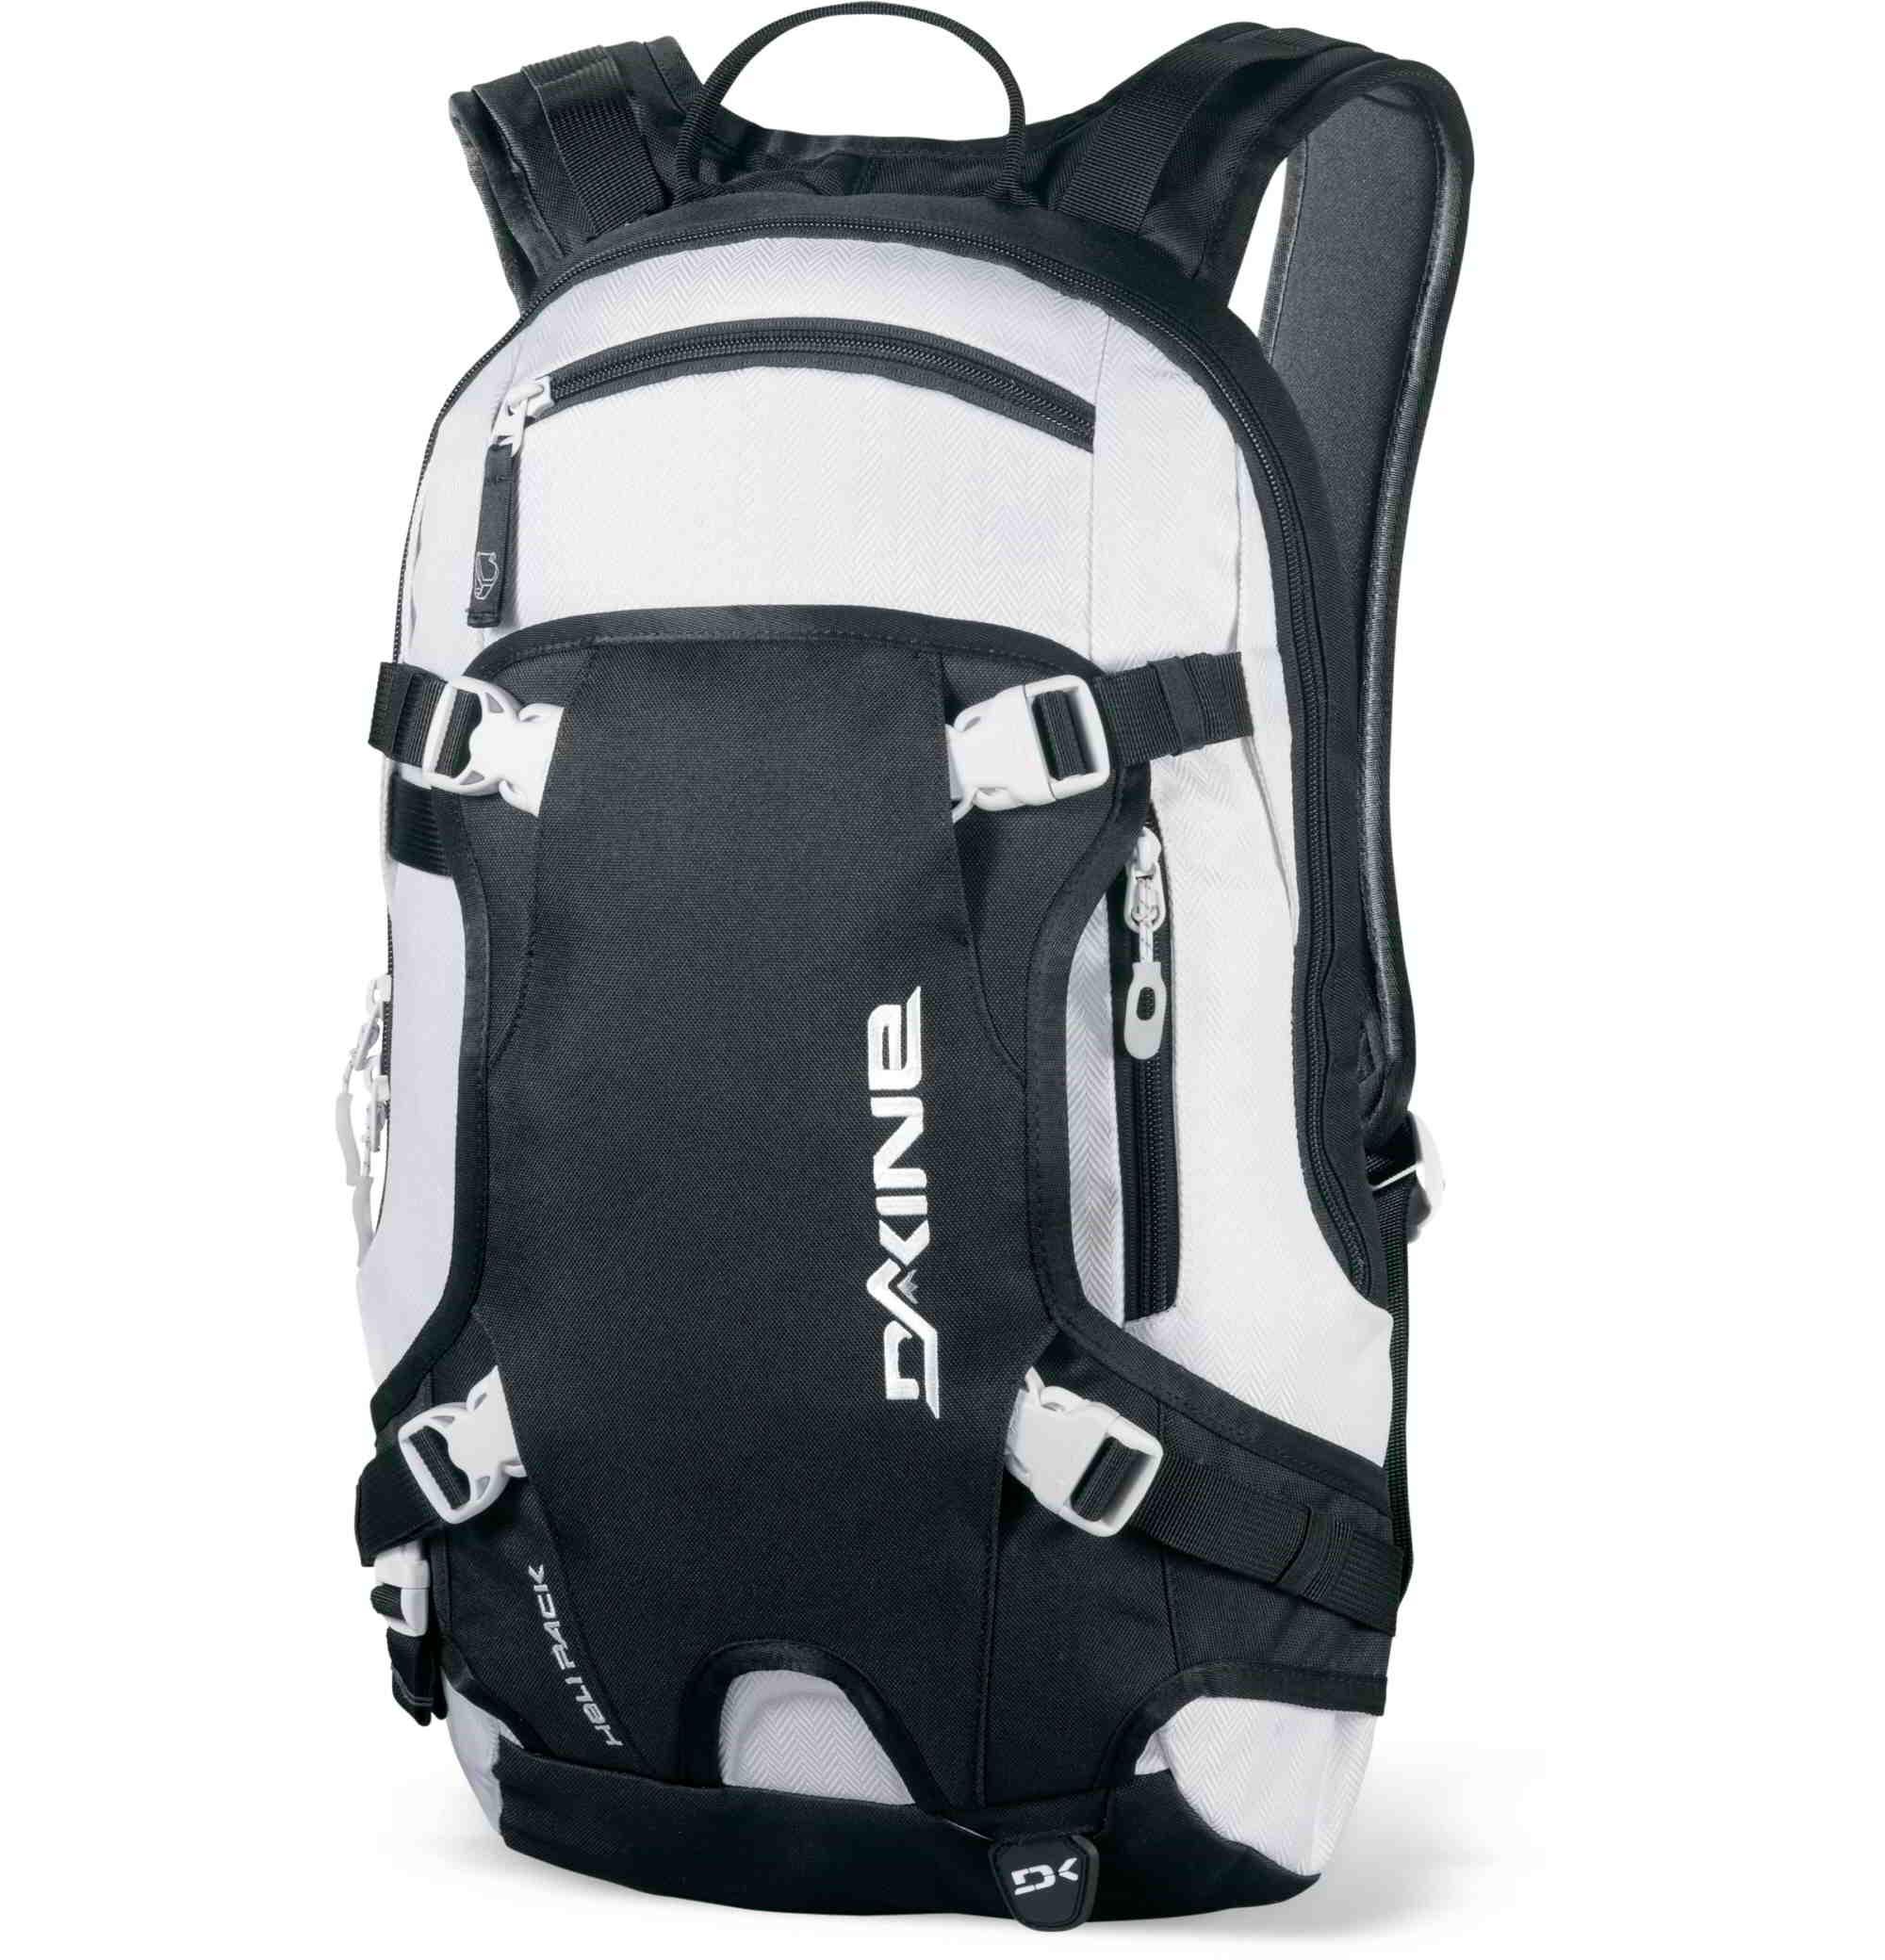 Dakine Heli Pack in Black White